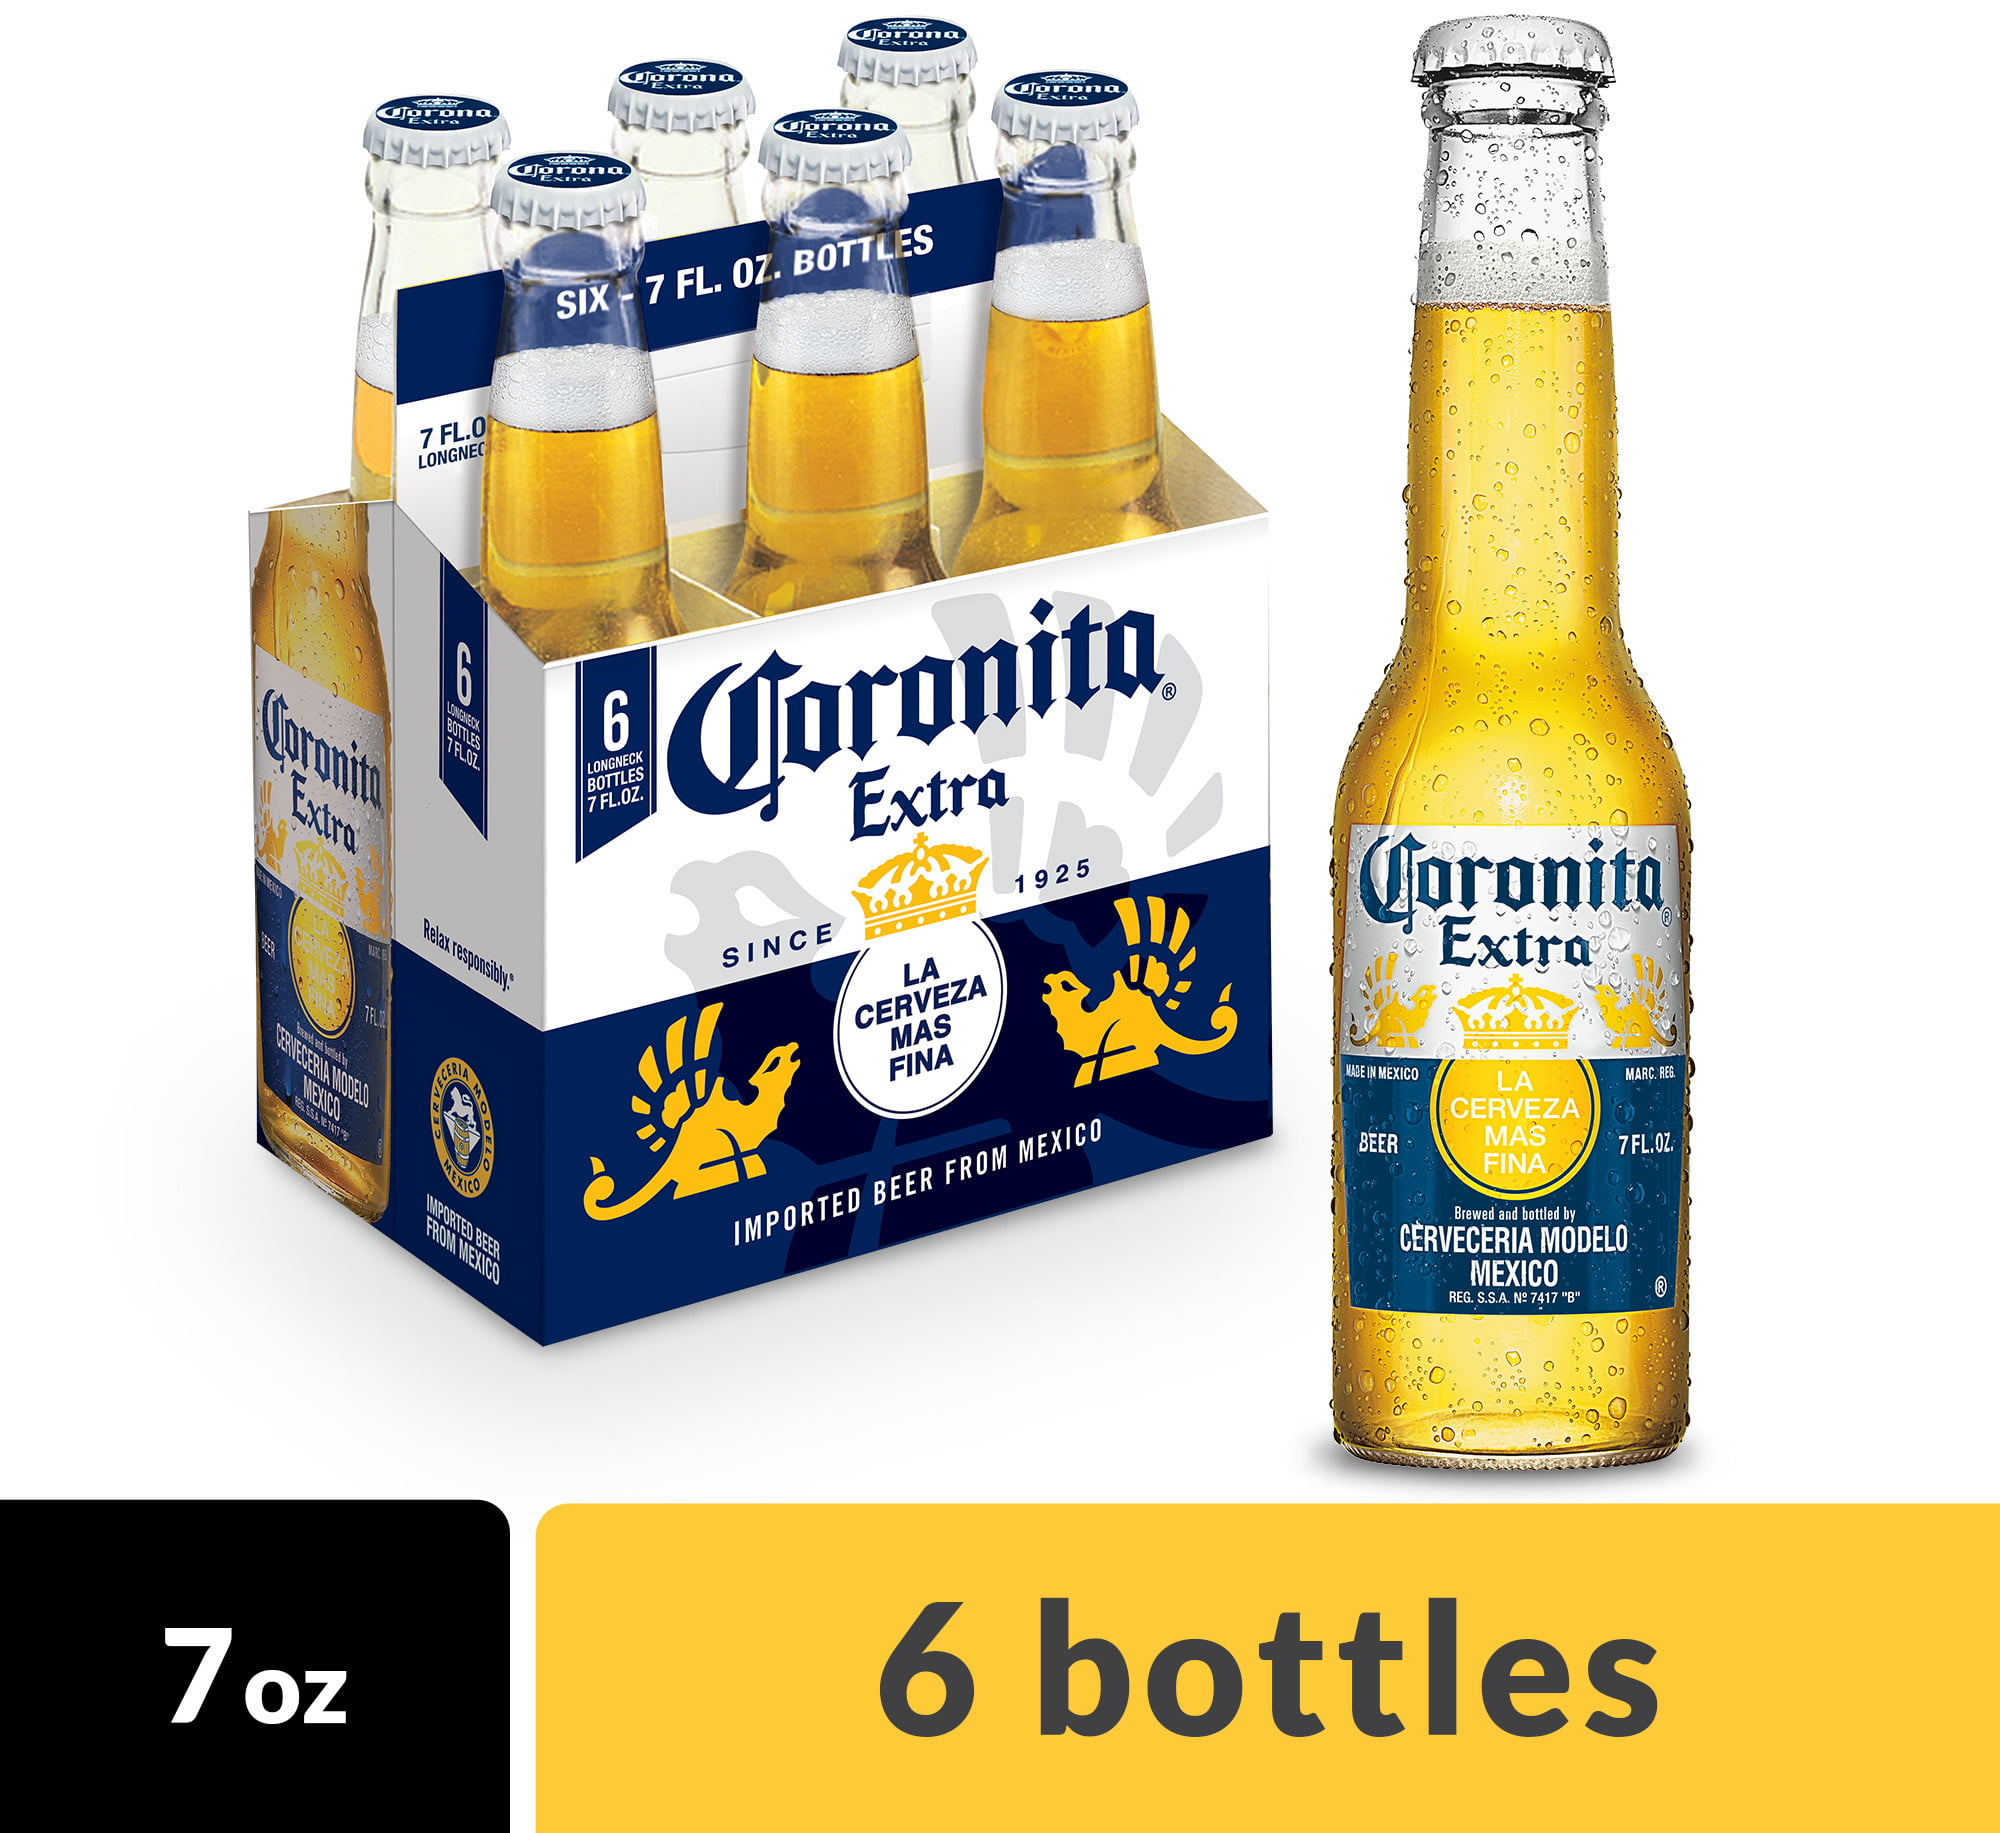 Corona Extra Coronita Mexican Lager